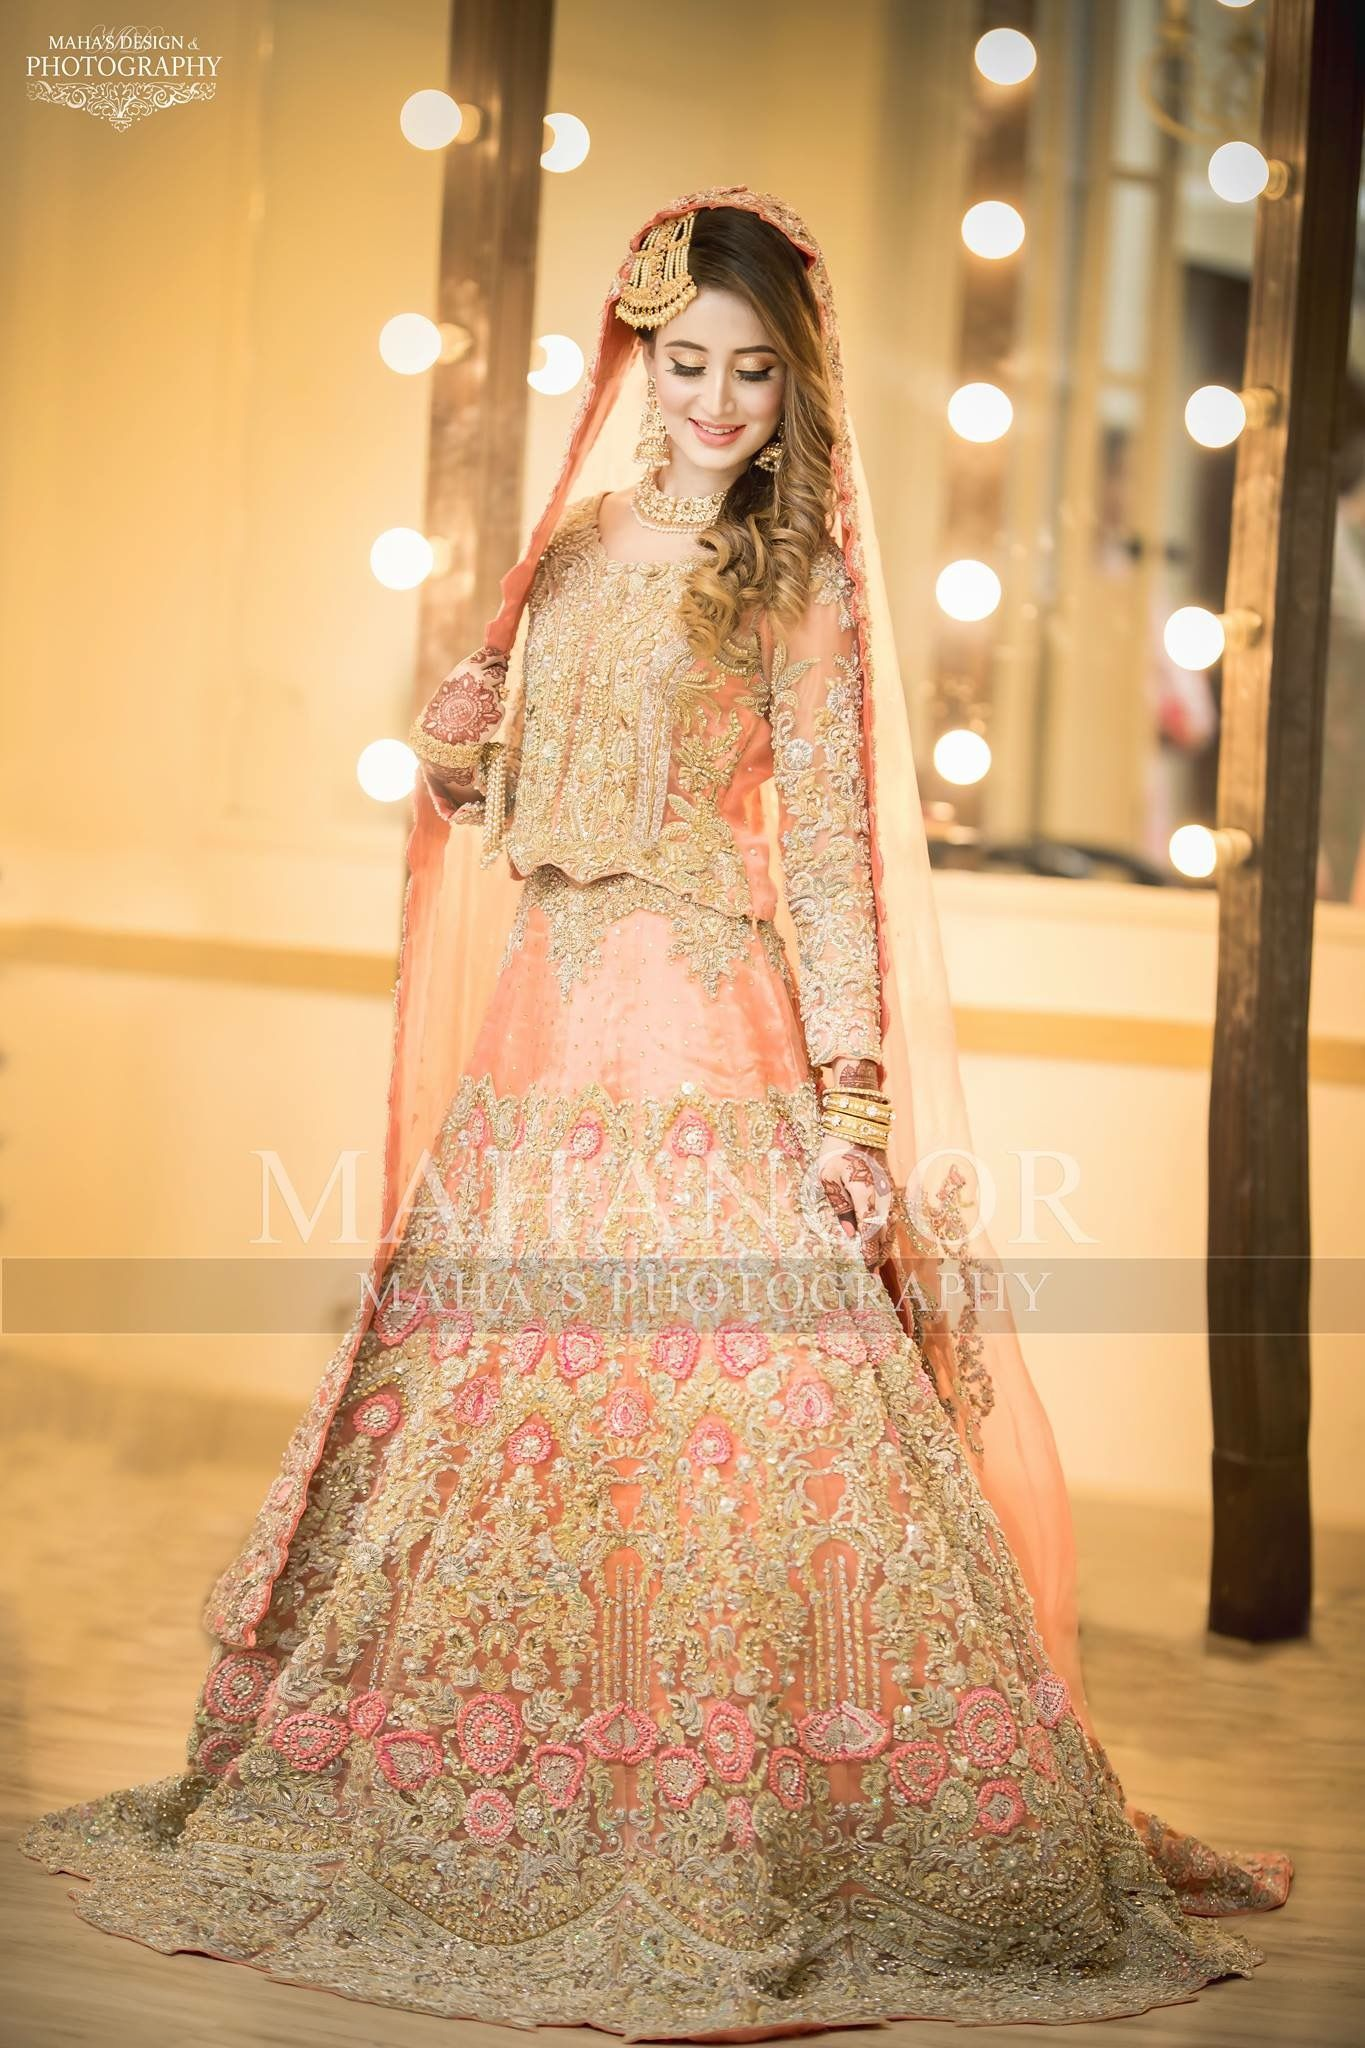 f275fae401 Pakistani bridal ✨**Be$t Tika &$ide jhoomar Hairstyle** board created by  **Haya Maik** ✨